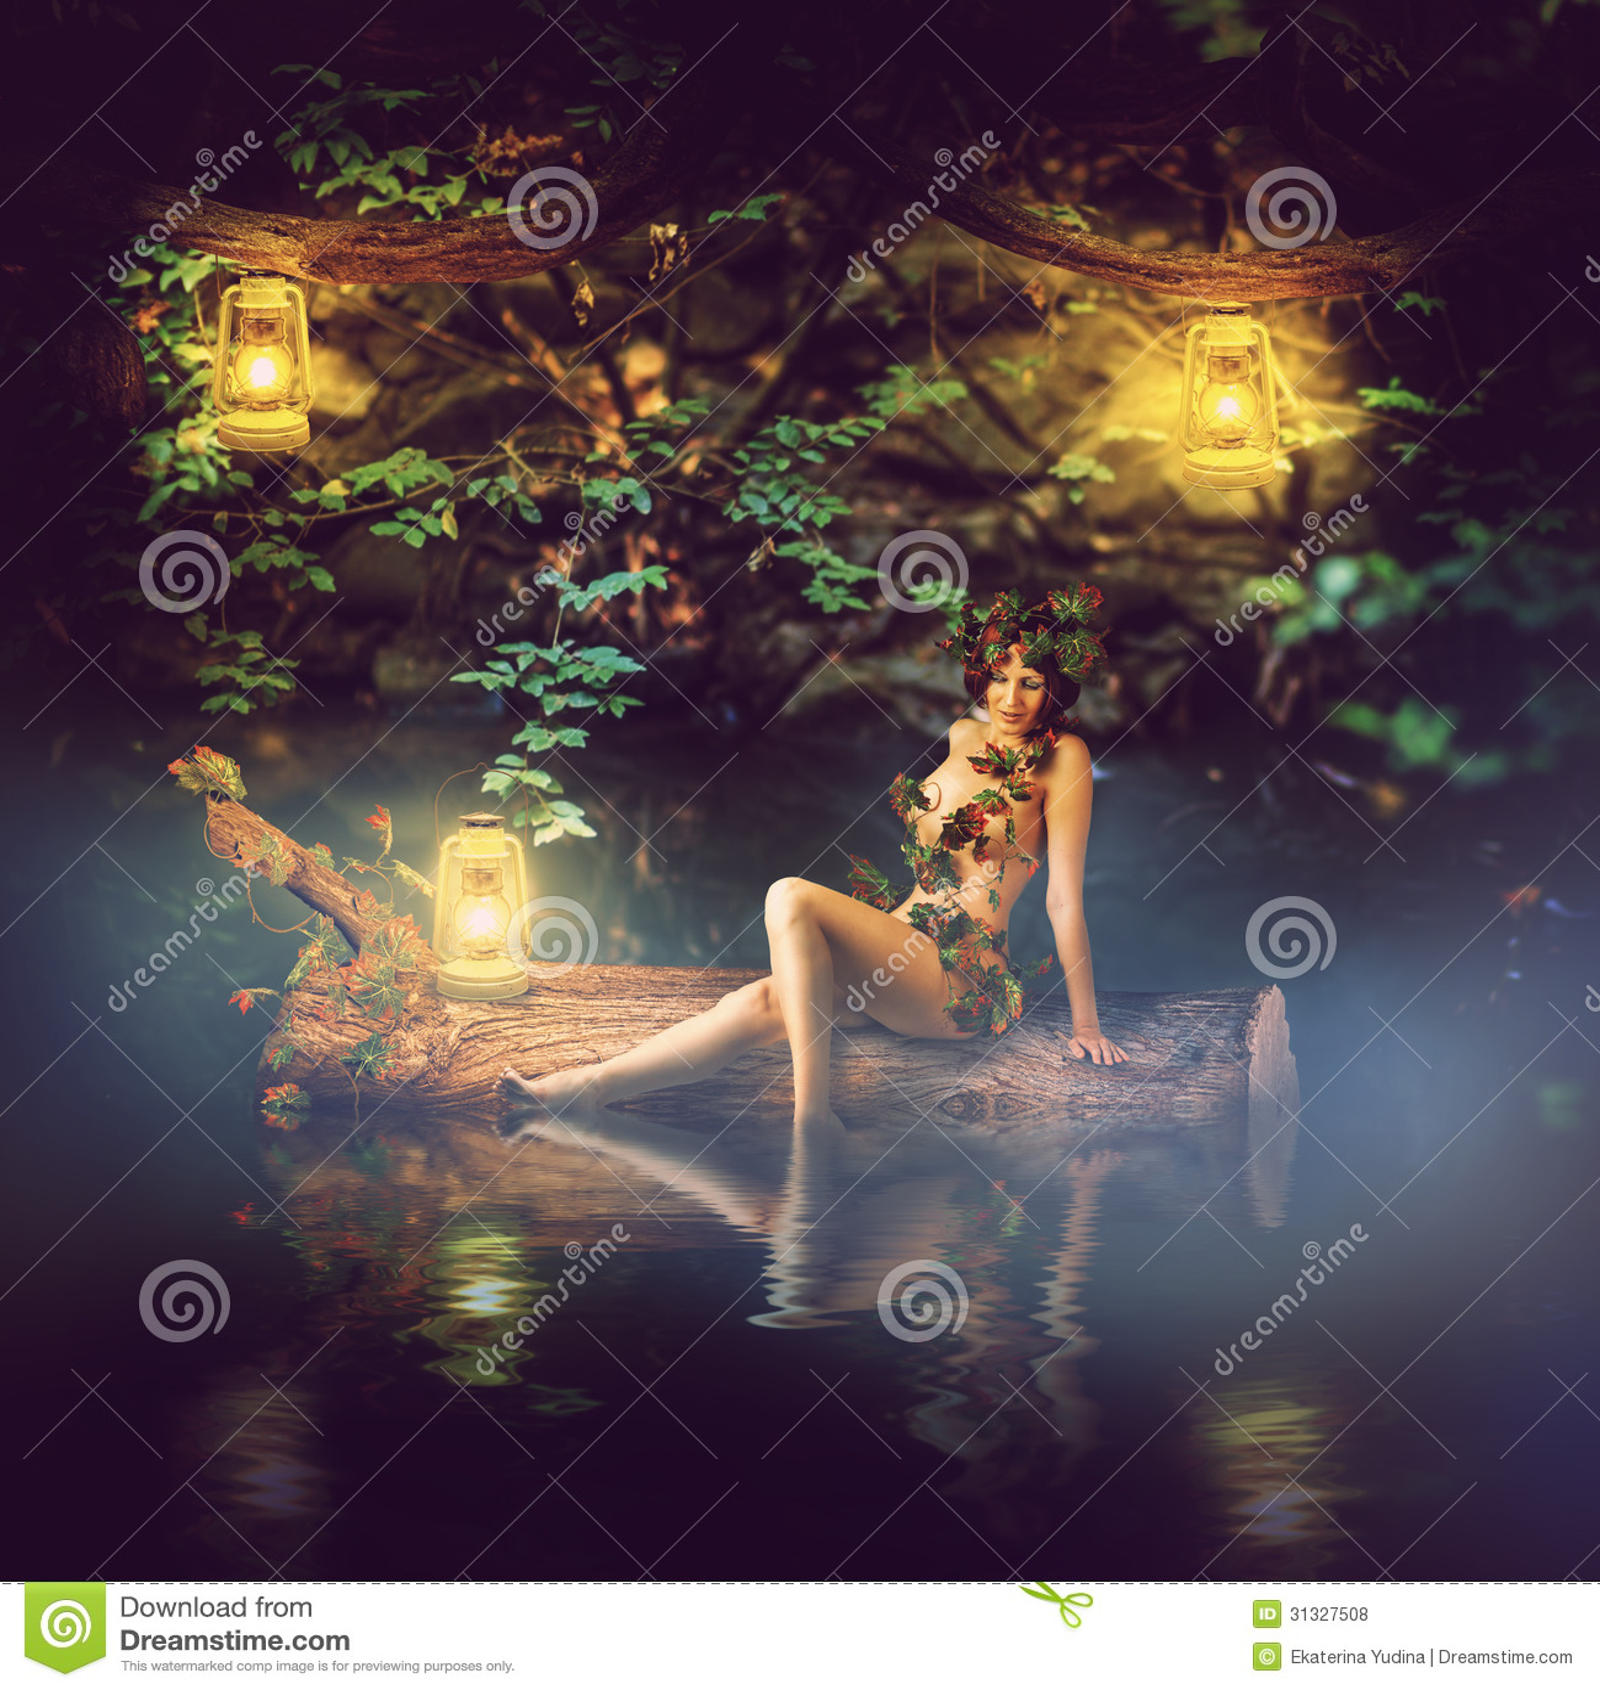 Fairytale Beautiful Woman Wood Nymph Royalty Free Stock